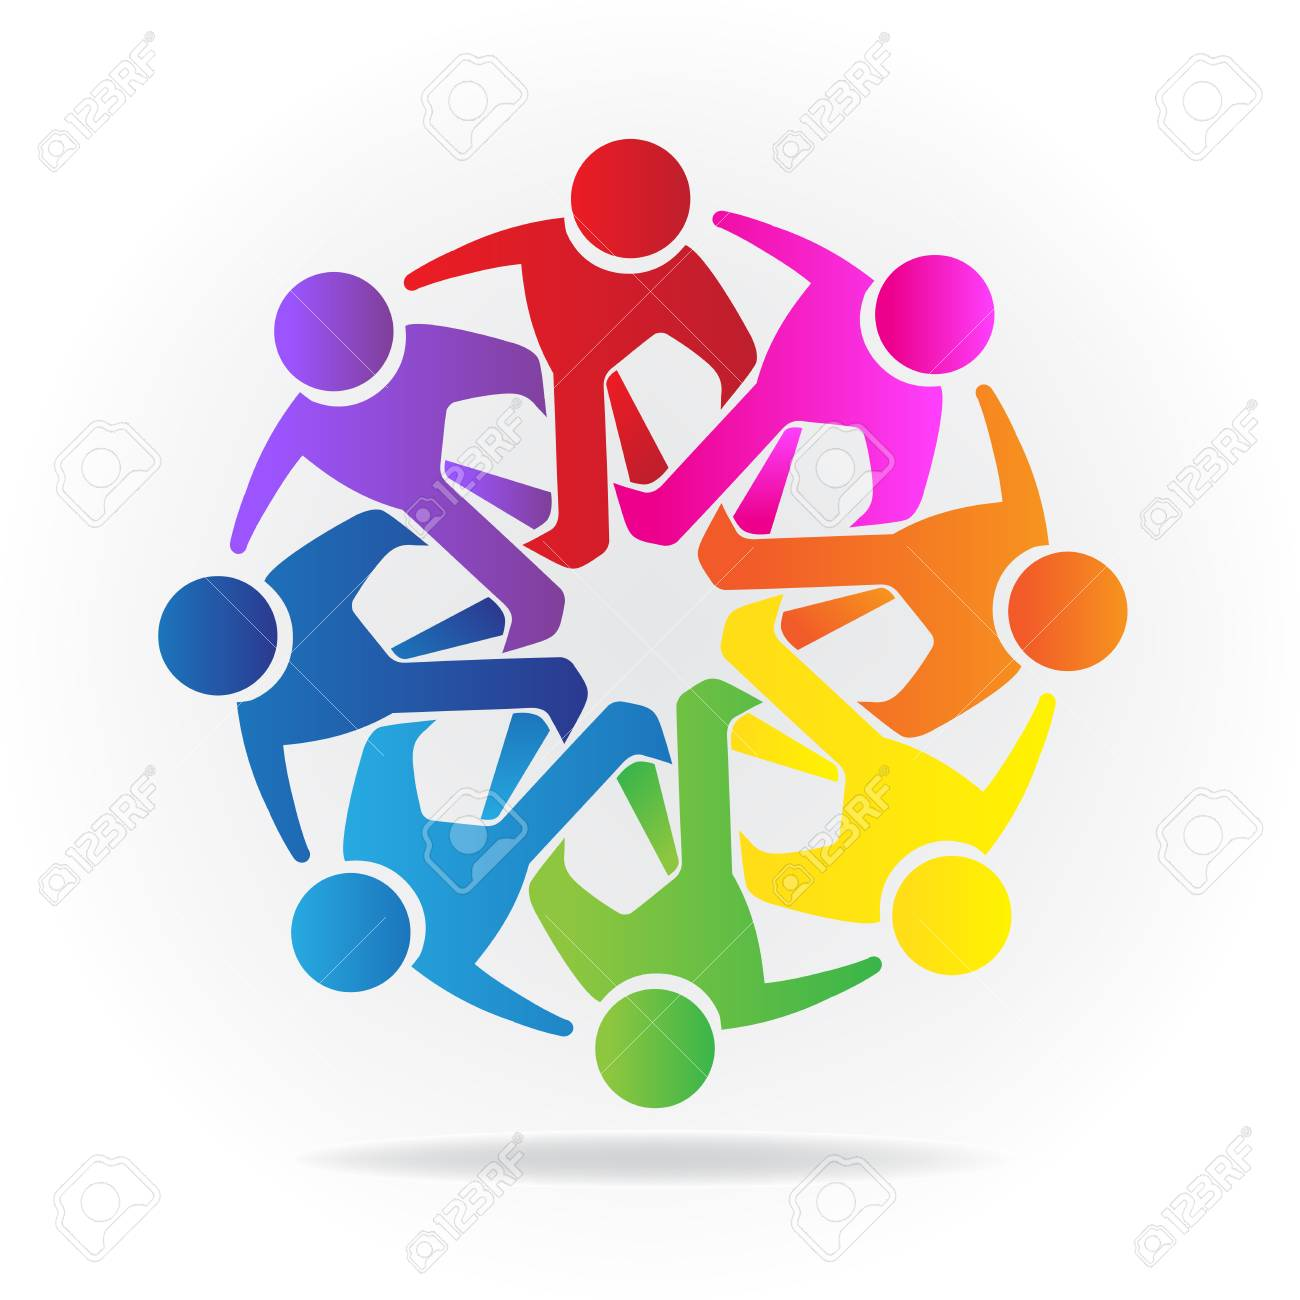 teamwork logo concept of friendship community union goals rh 123rf com free vector graphics program free vector graphic download